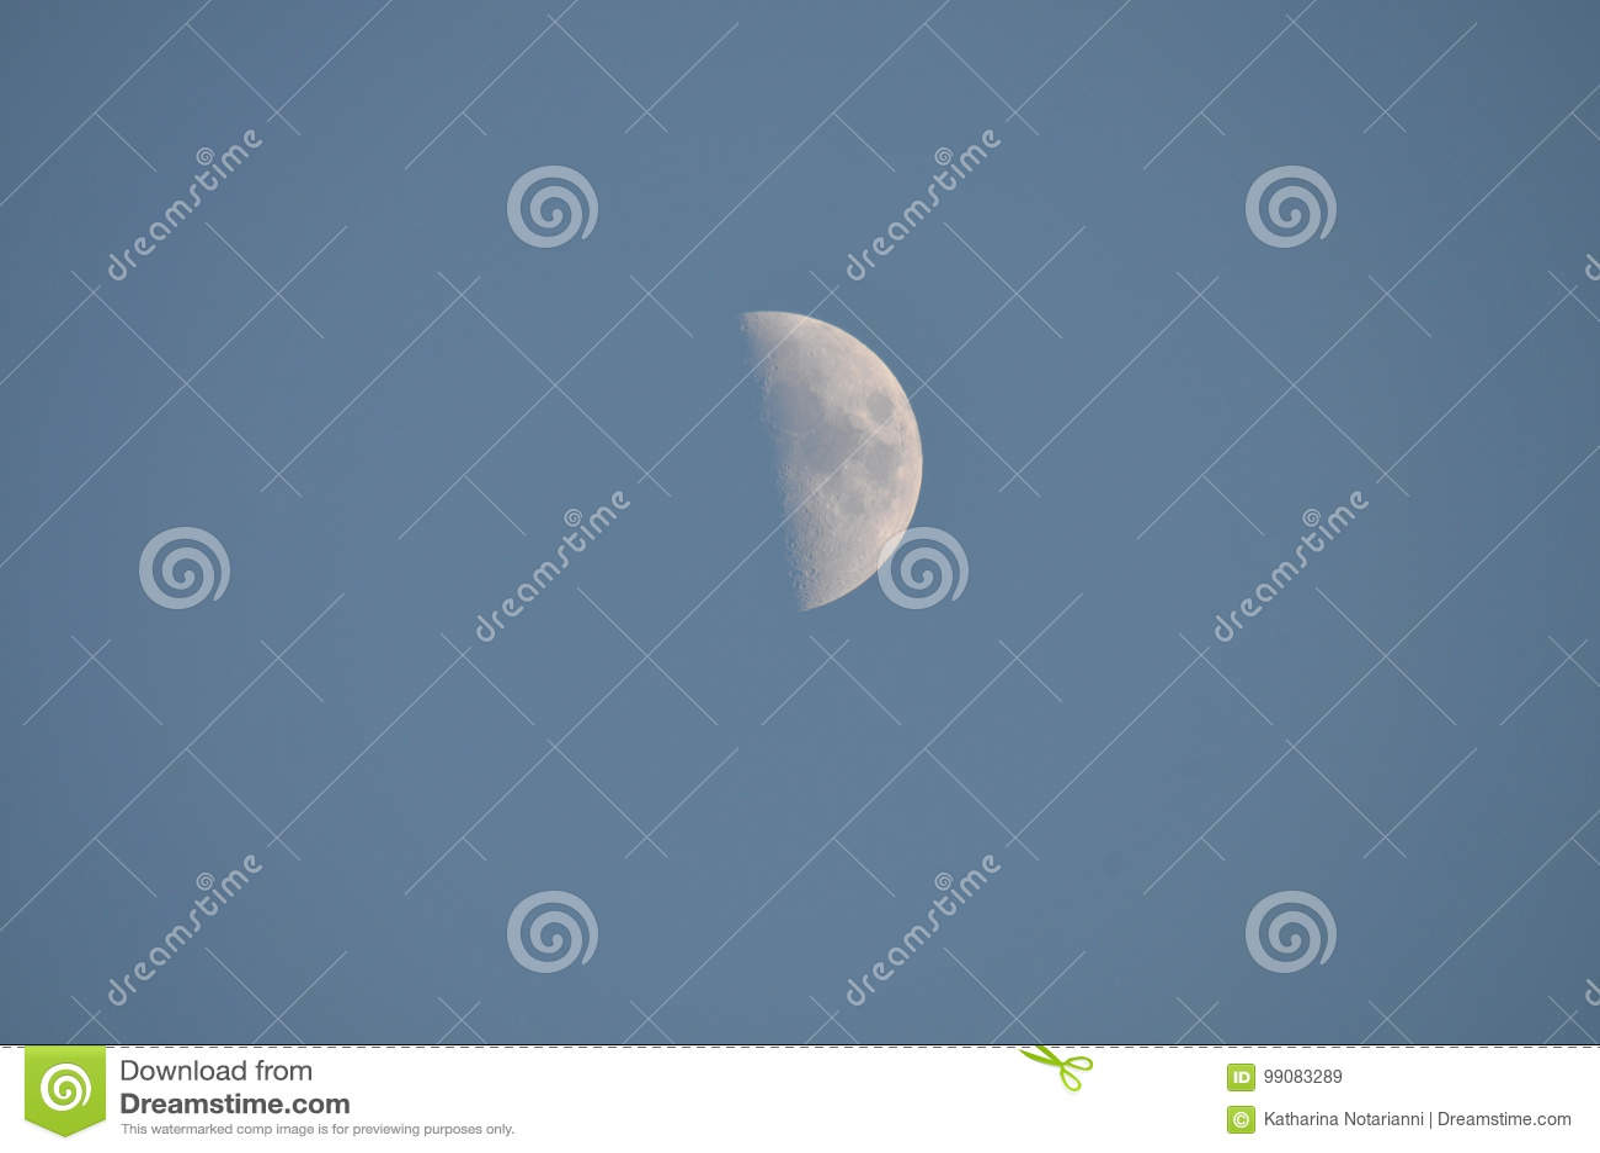 Half Moon in Daytime Sky